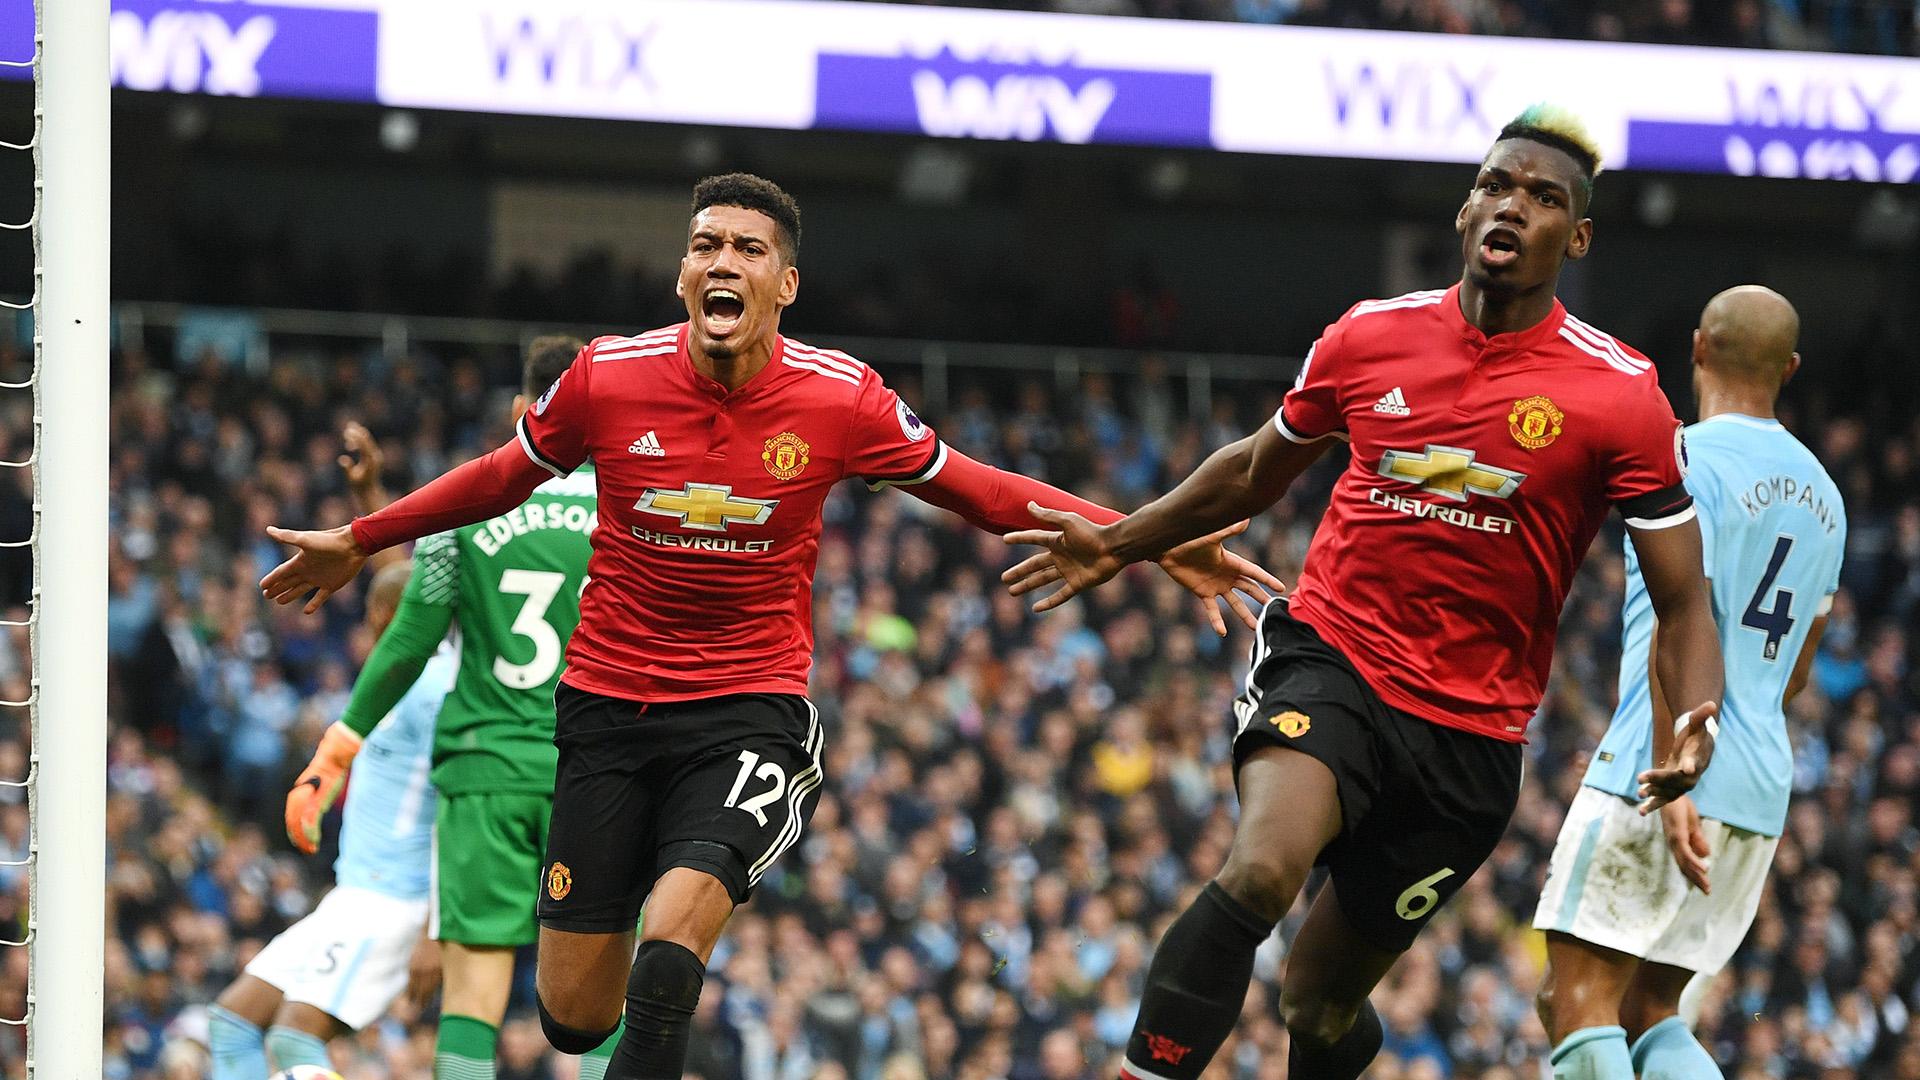 Chris Smalling Paul Pogba Manchester City Manchester United Premier League